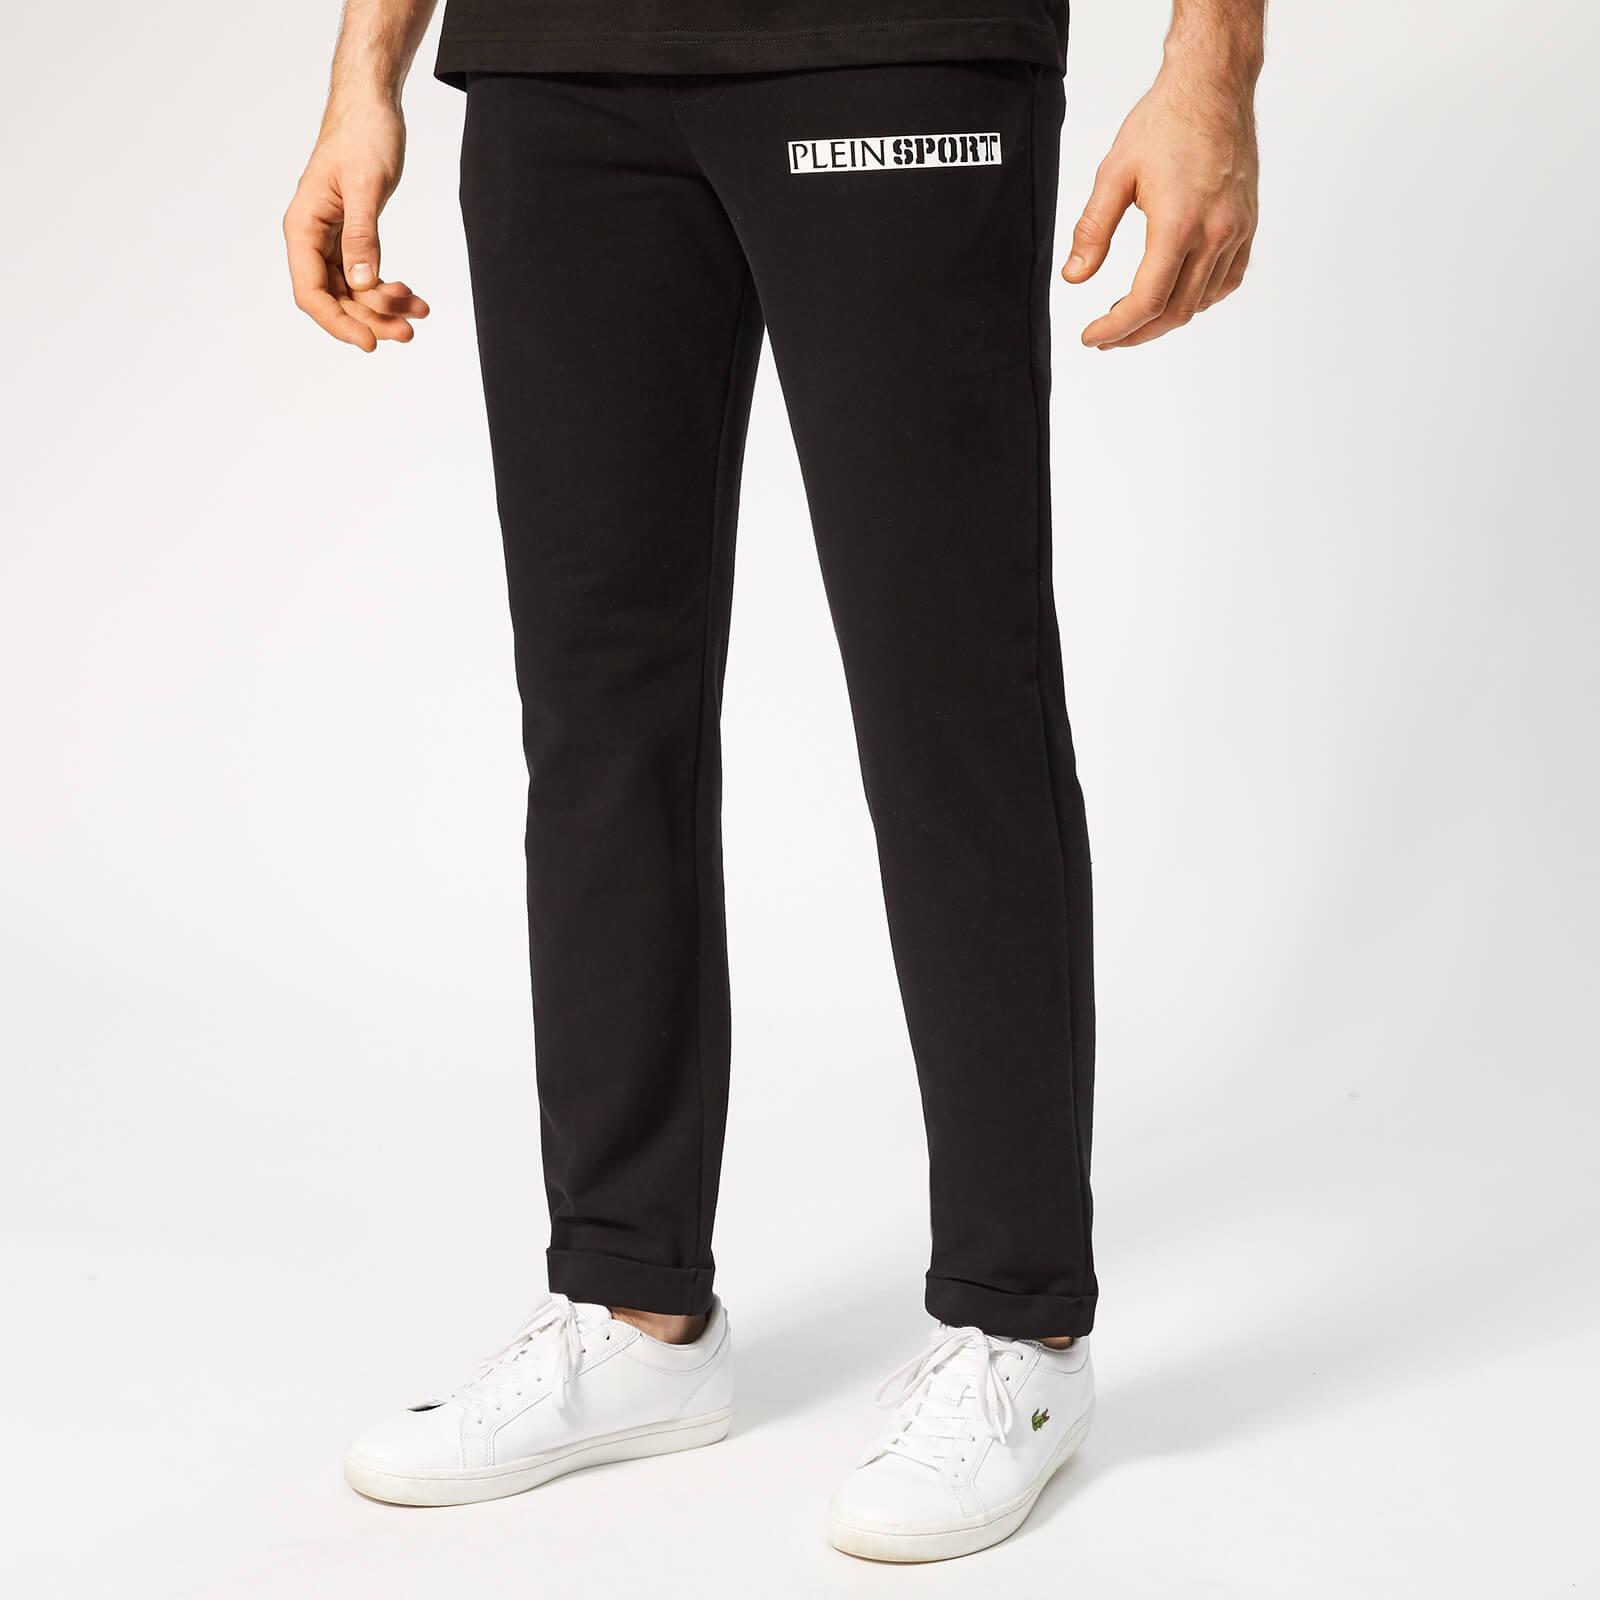 Plein Sport Men's Statement Jogging Trousers - Black - M - Black